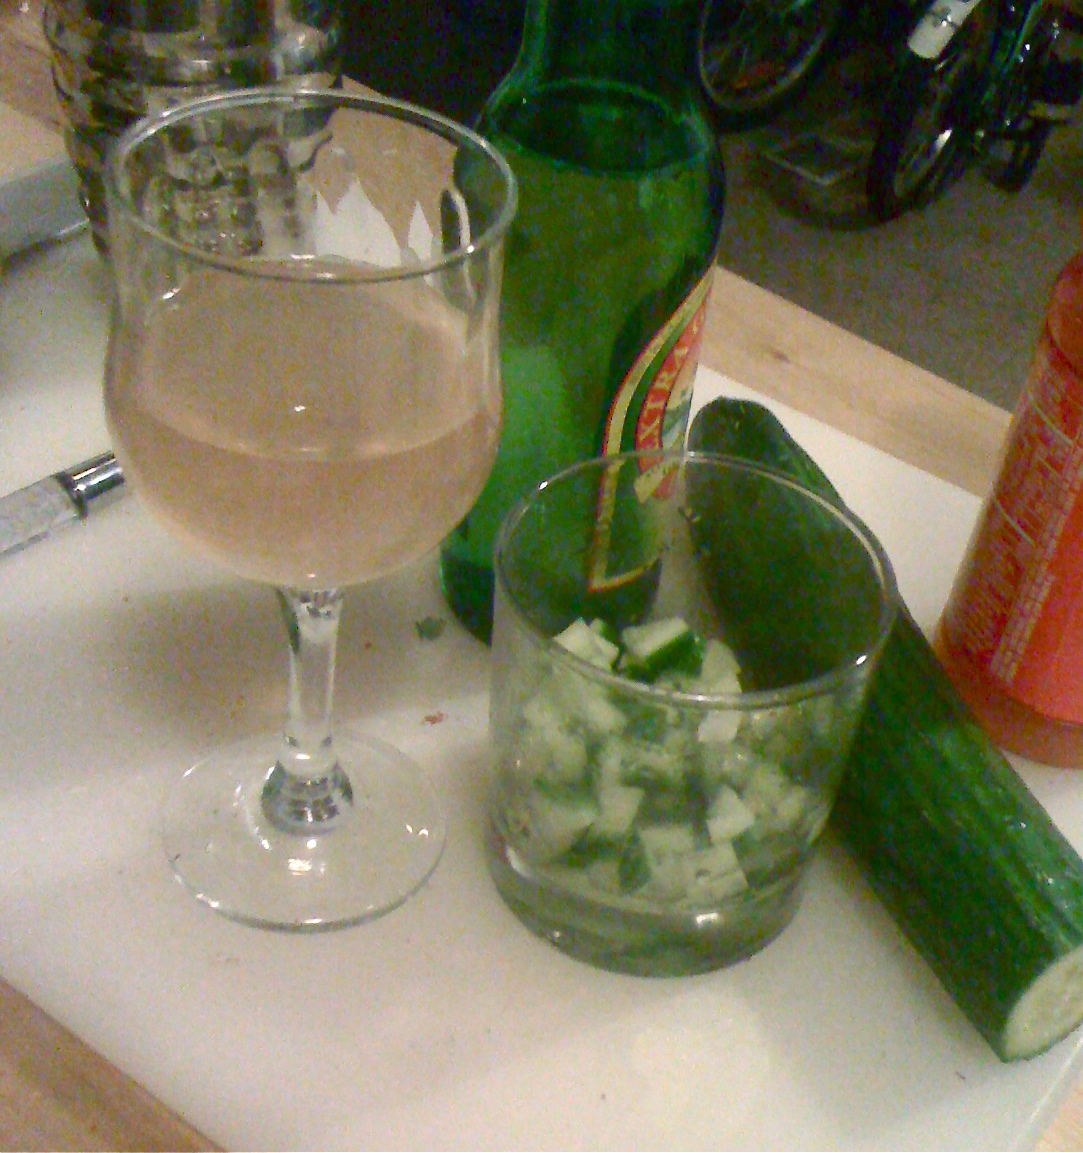 Wheaton's Elixir